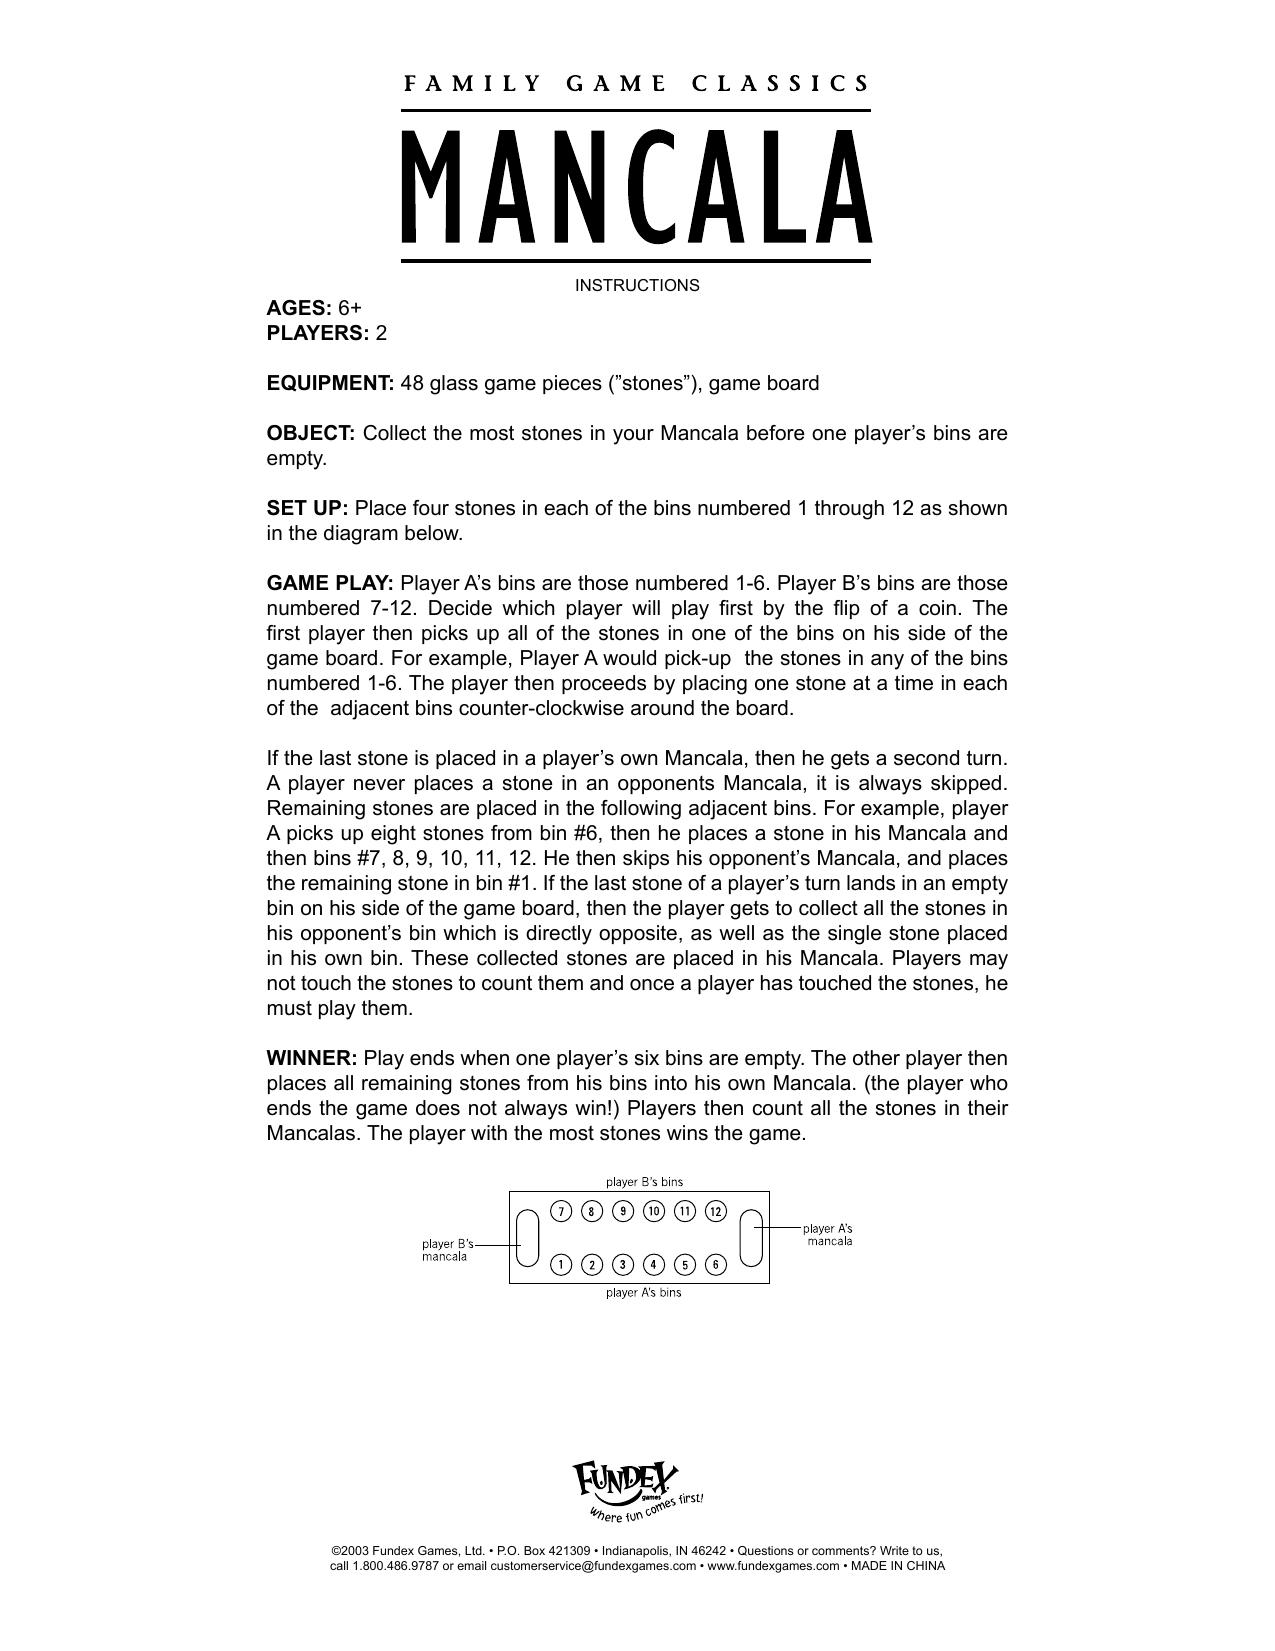 Fundex Games Board Games Mancala User Manual Manualzz